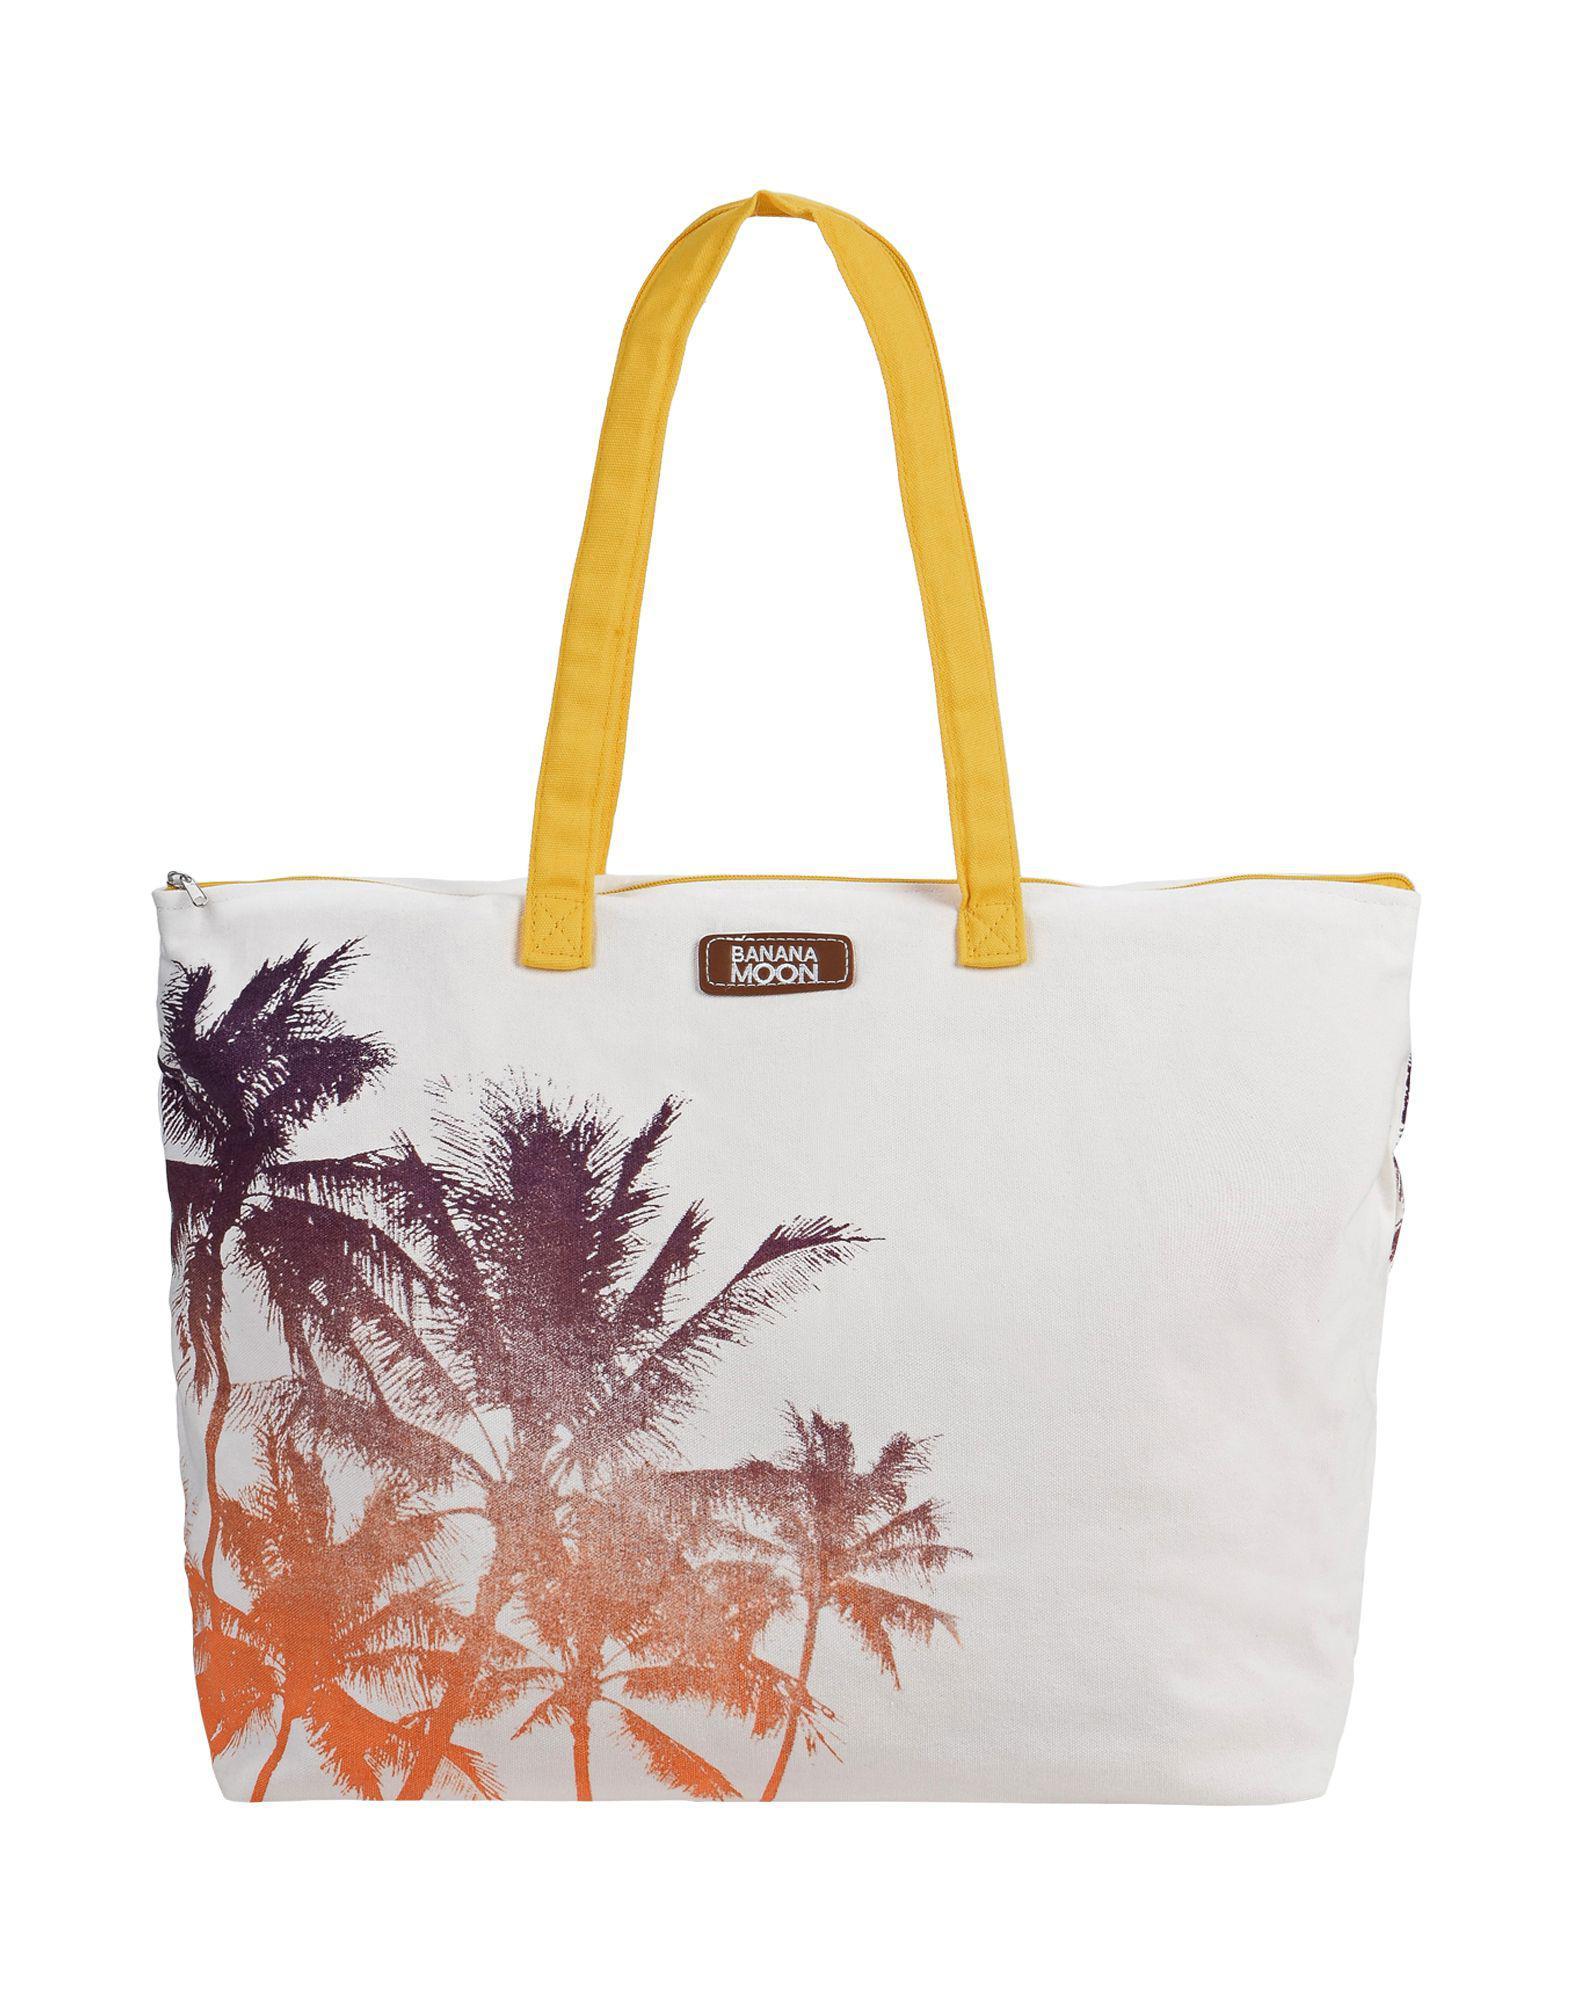 Lyst In Handbag White Banana Moon wZq6ZPB